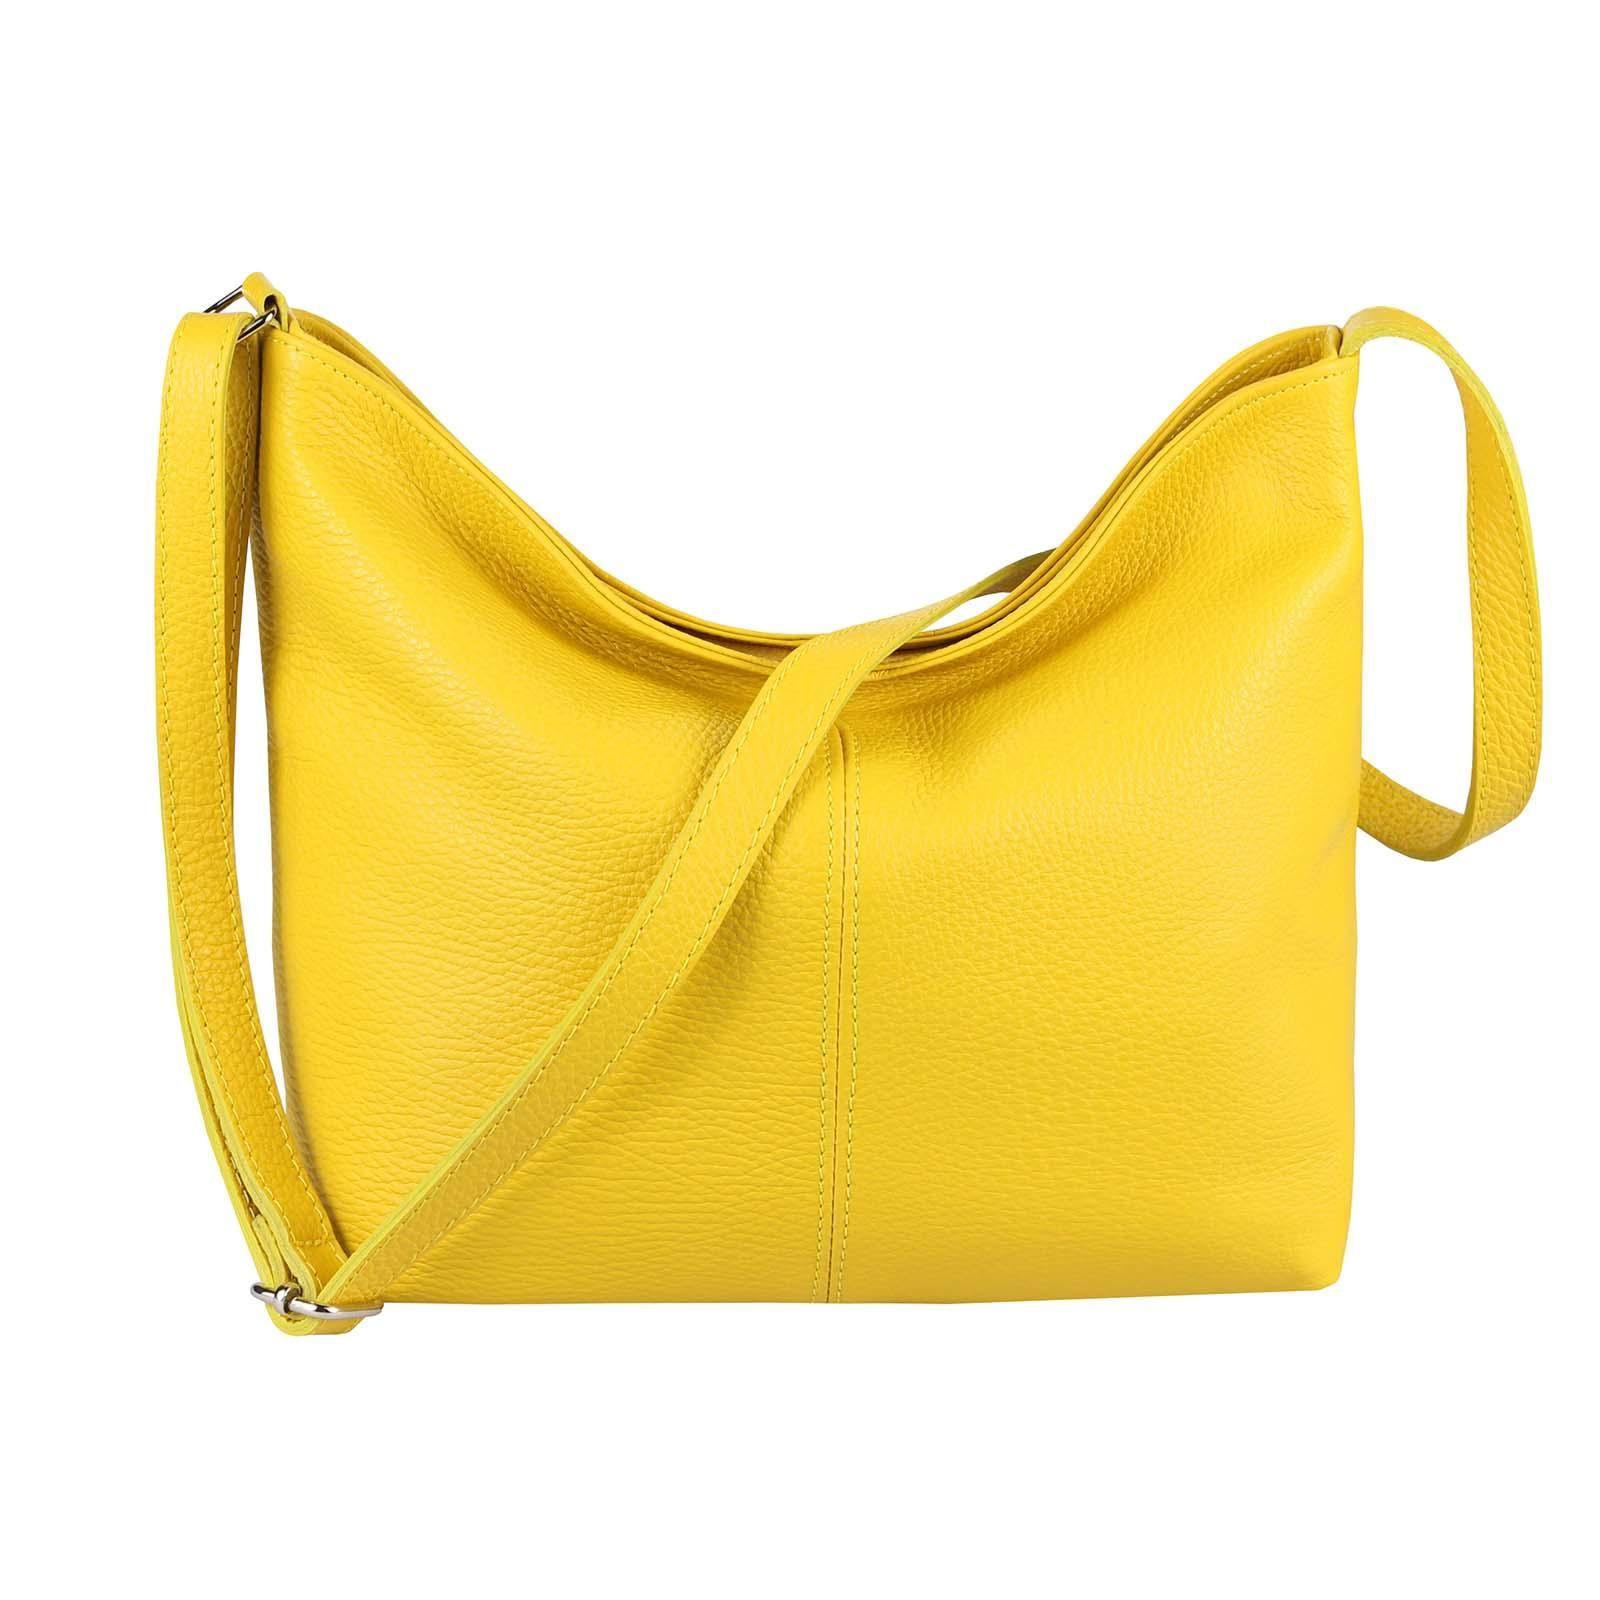 Damentaschen ITALy DAMEN LEDER TASCHE Schultertasche Cross-Over Umhängetasche Handtasche BAG